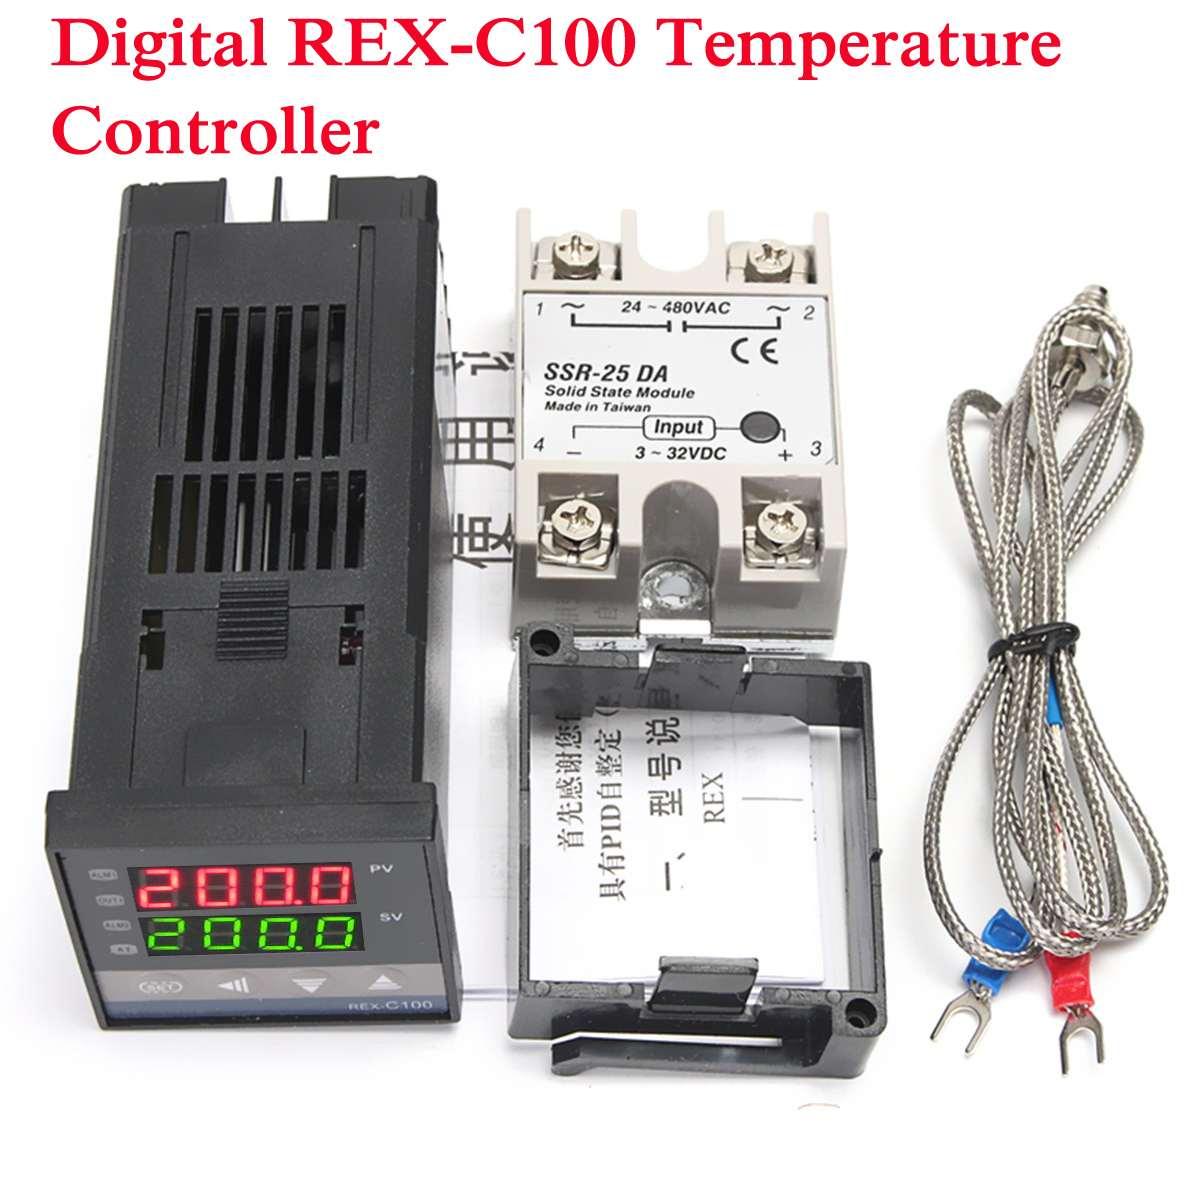 1 satz Digital 220 v PID REX-C100 Temperatur Controller + 25A SSR + K Thermoelement Sonde Kabel K Sensor